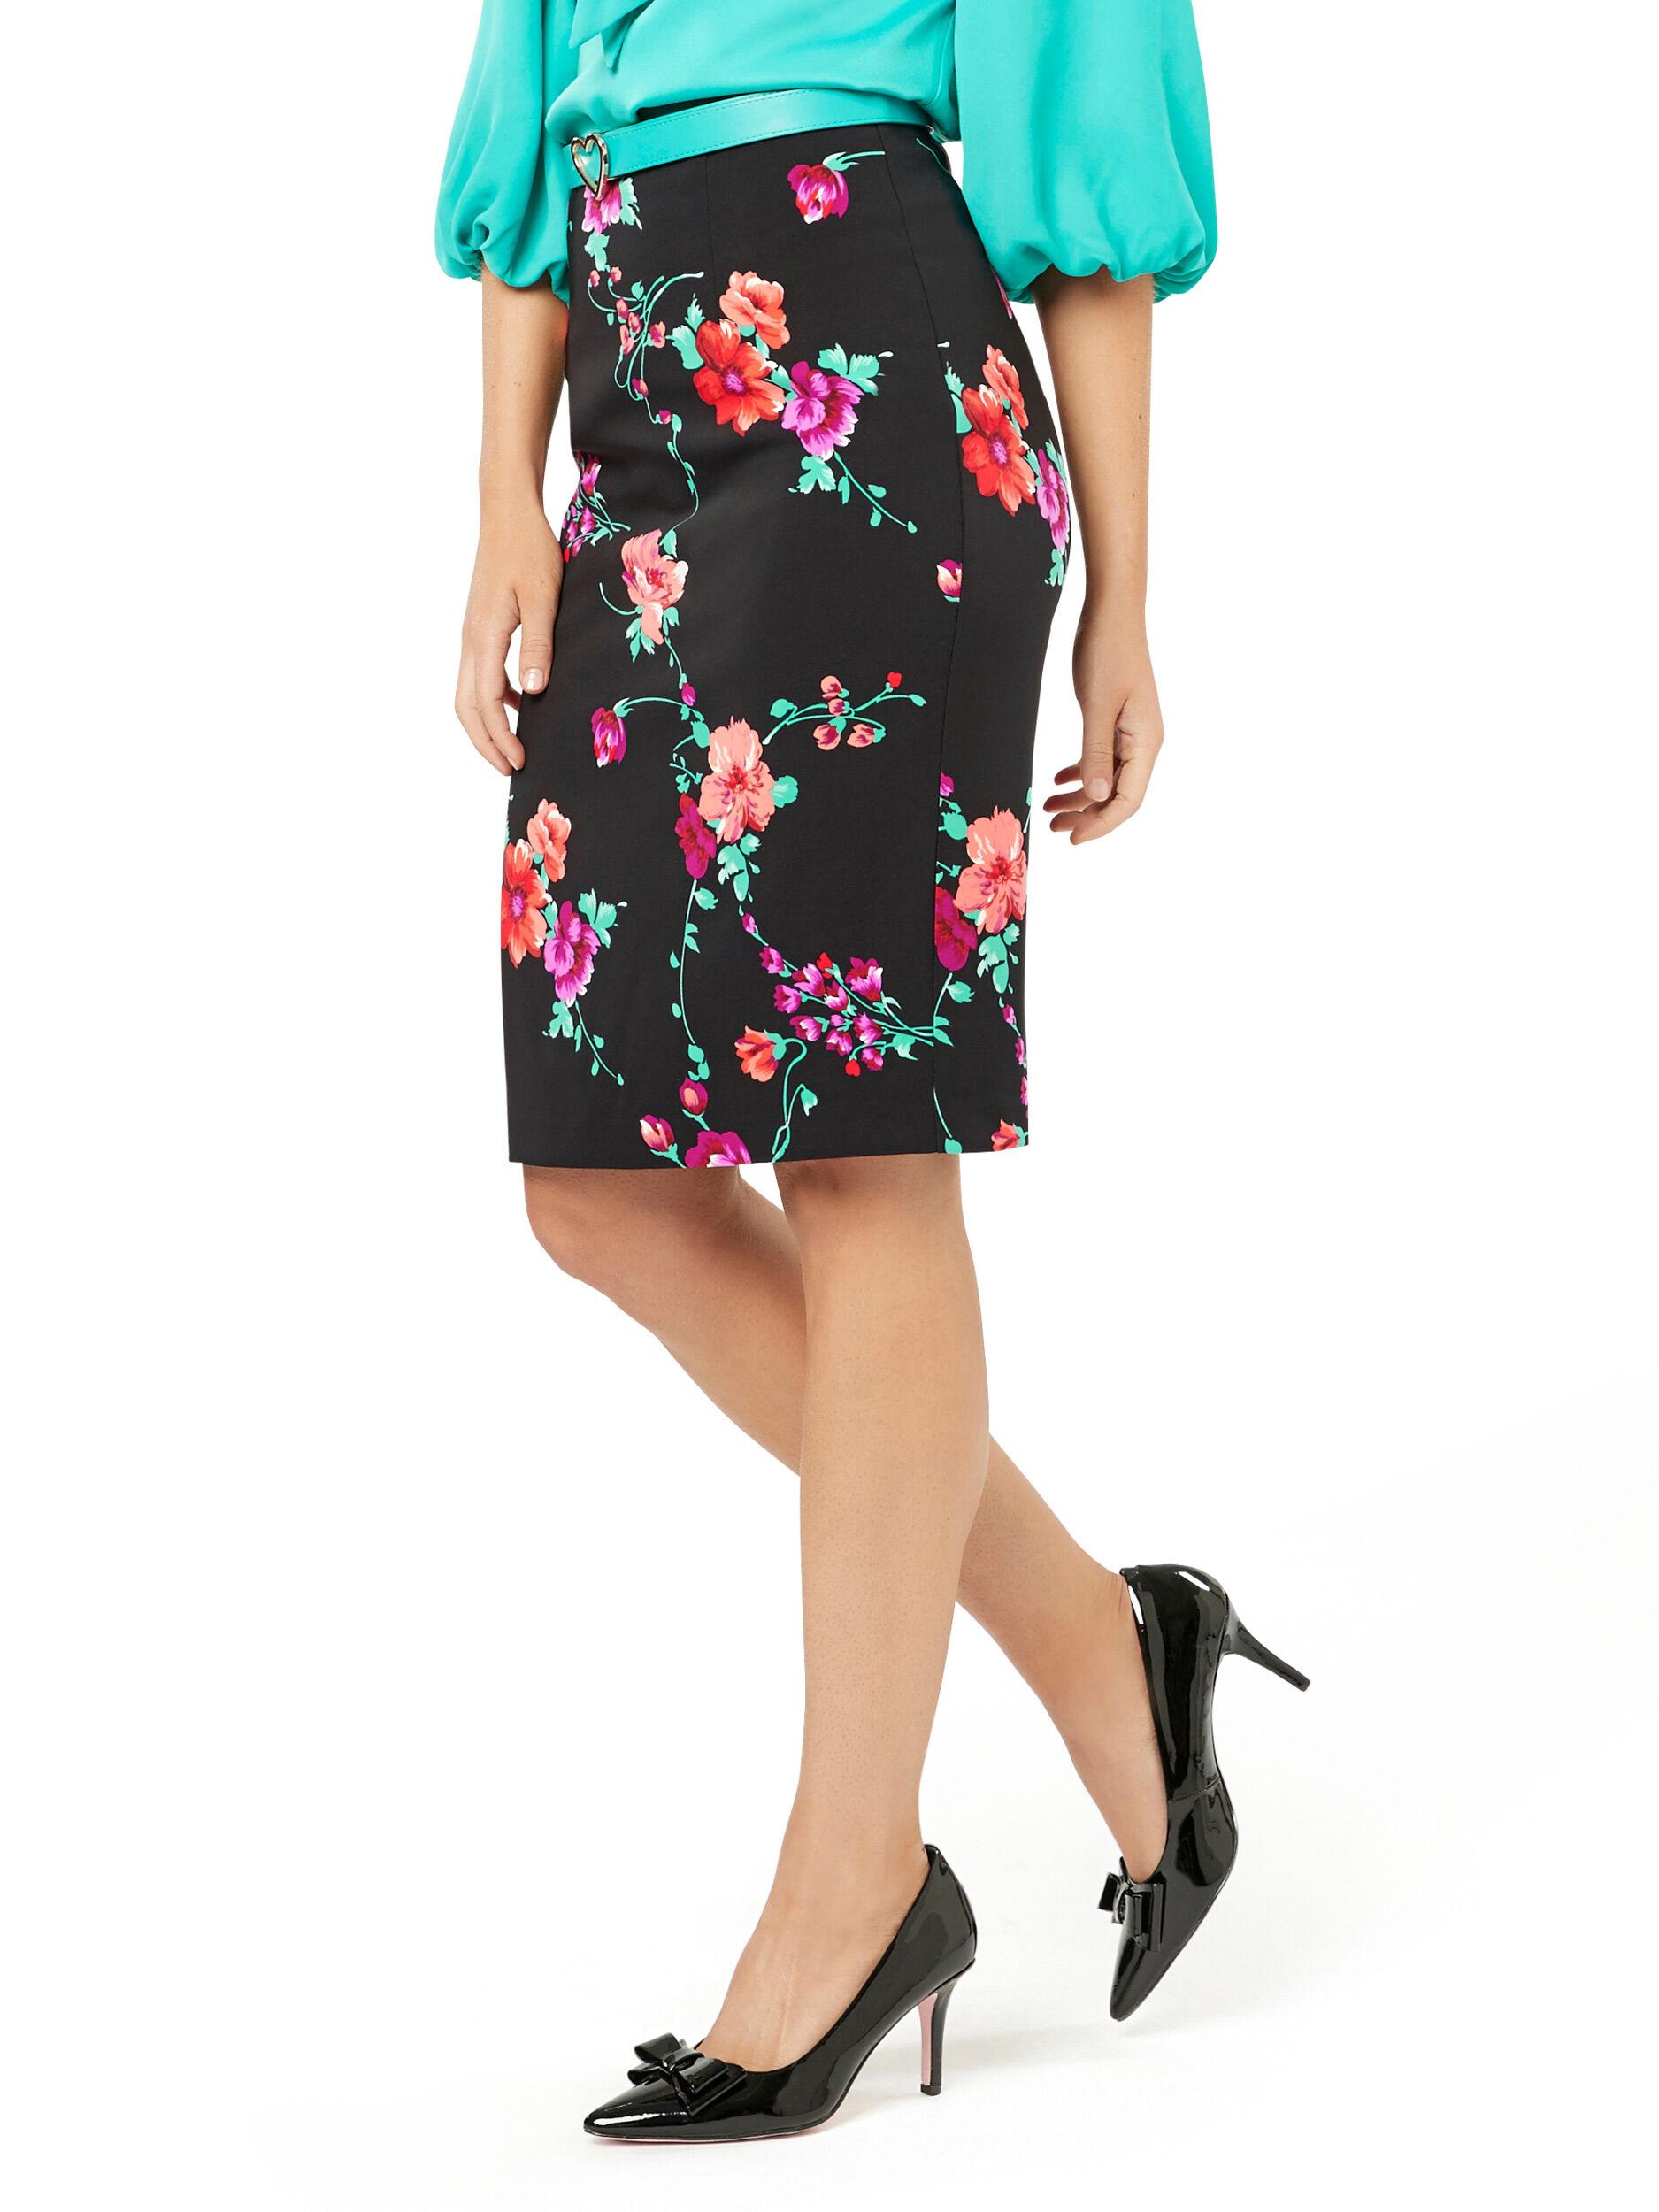 Hera Floral Skirt